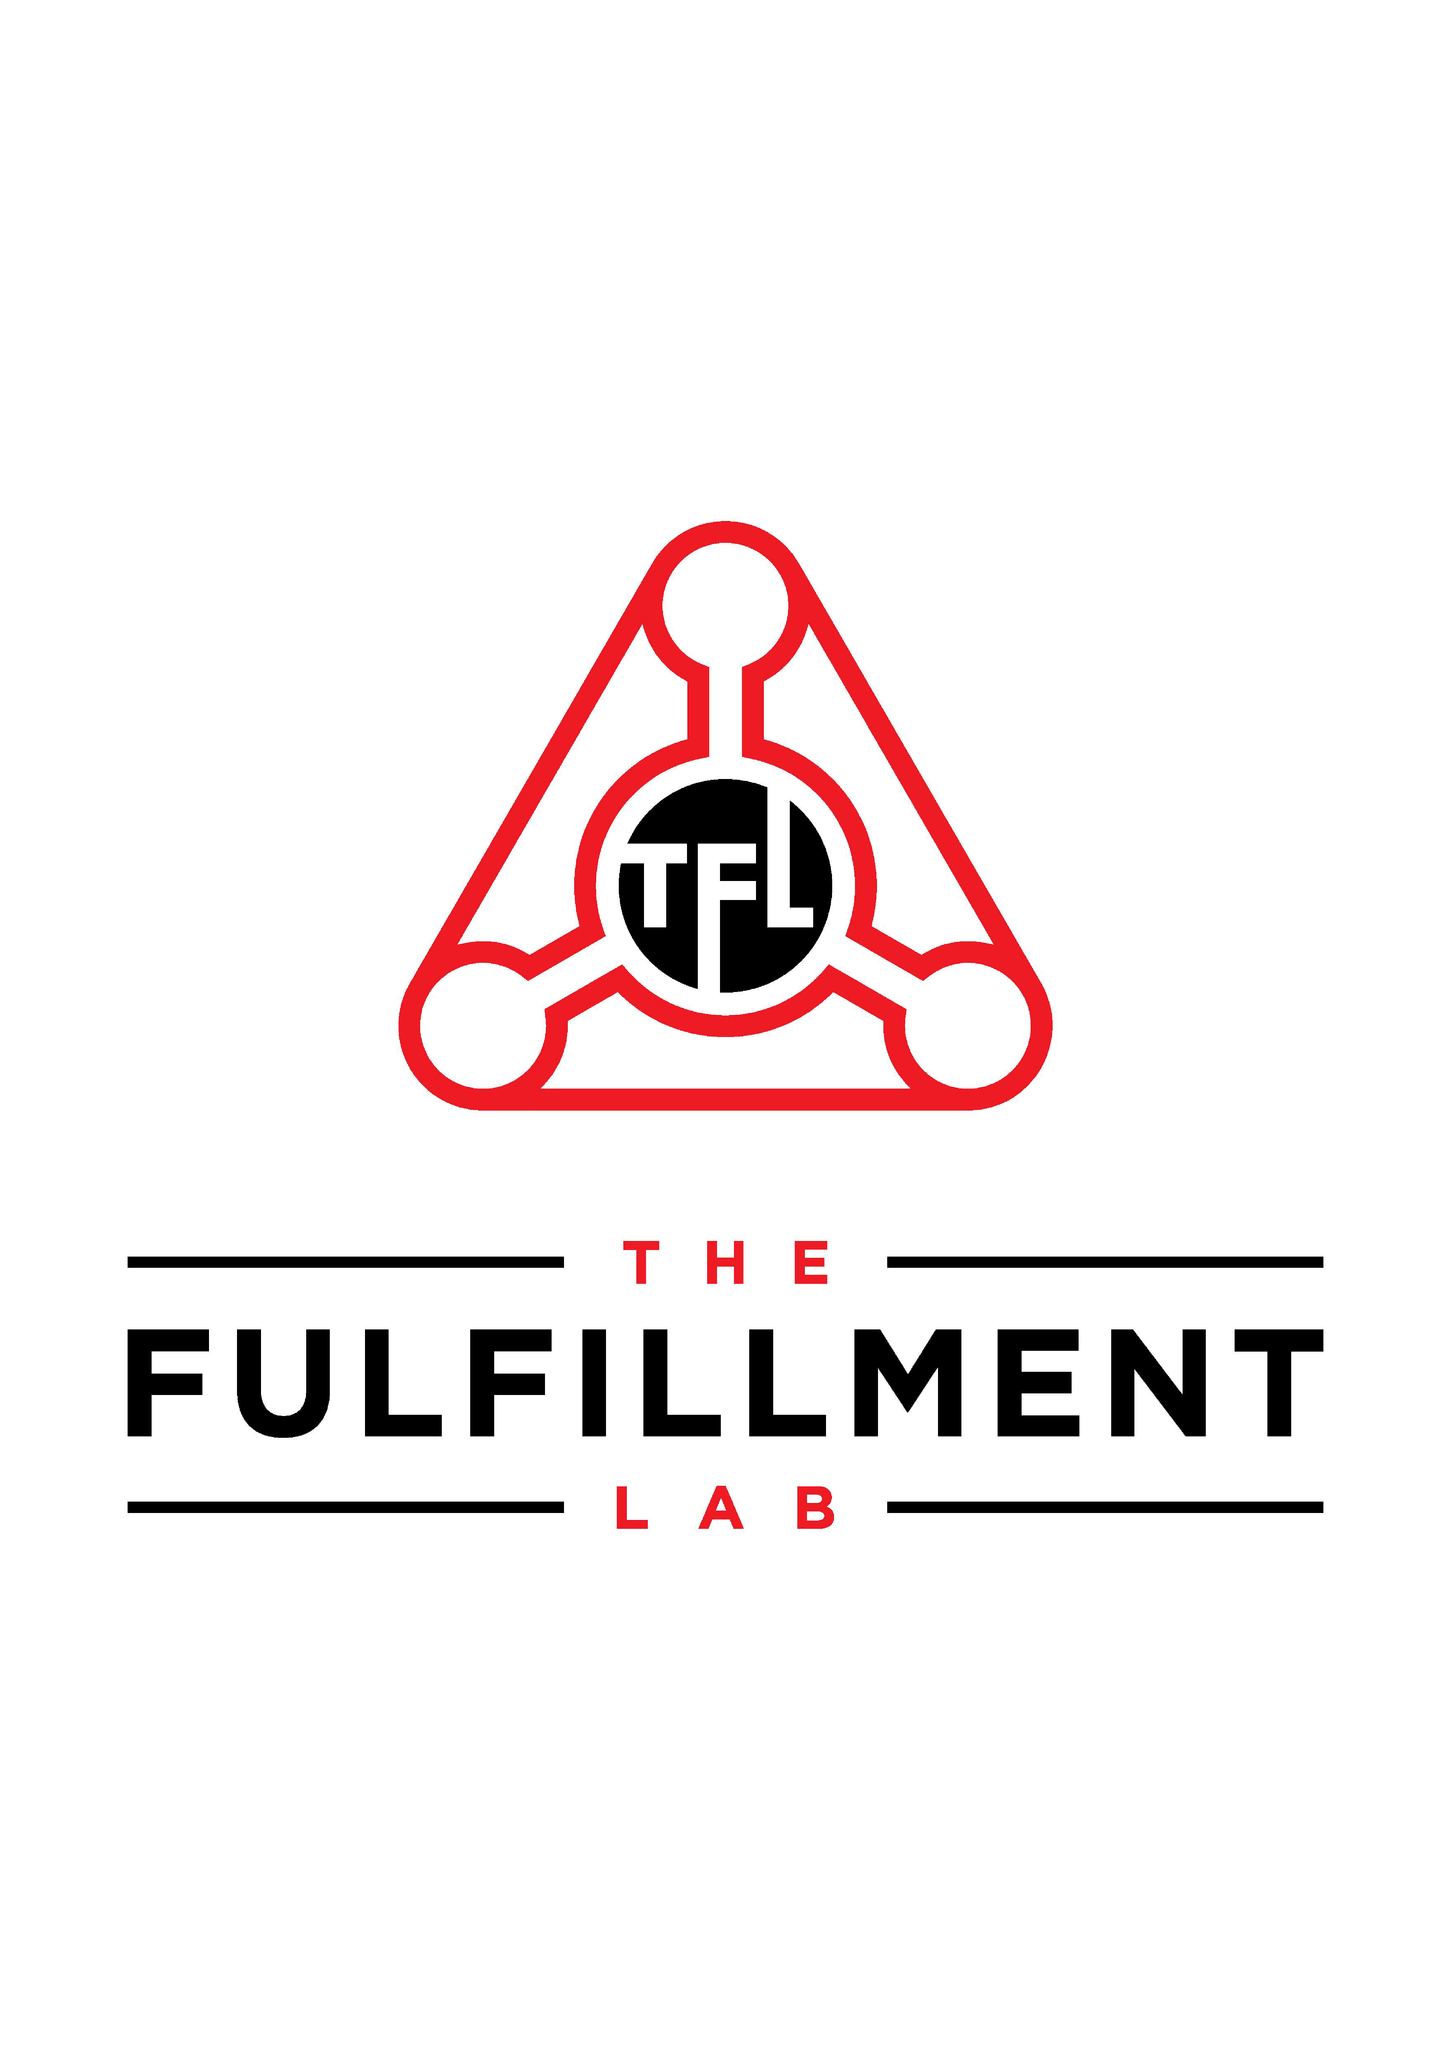 The Fulfillment Lab